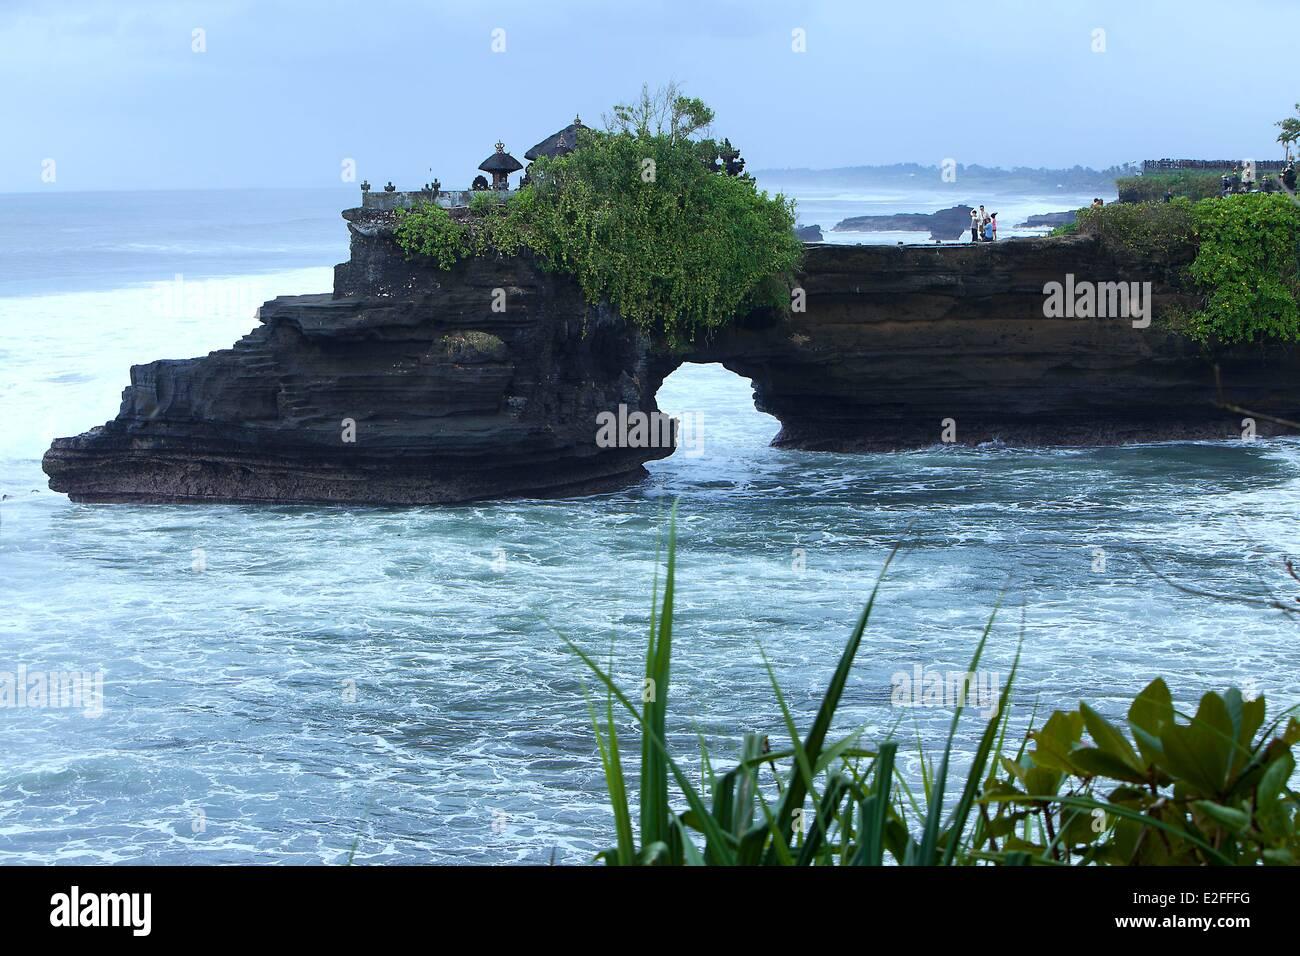 Indonesia, Bali, Pura Tanah Lot Temple - Stock Image